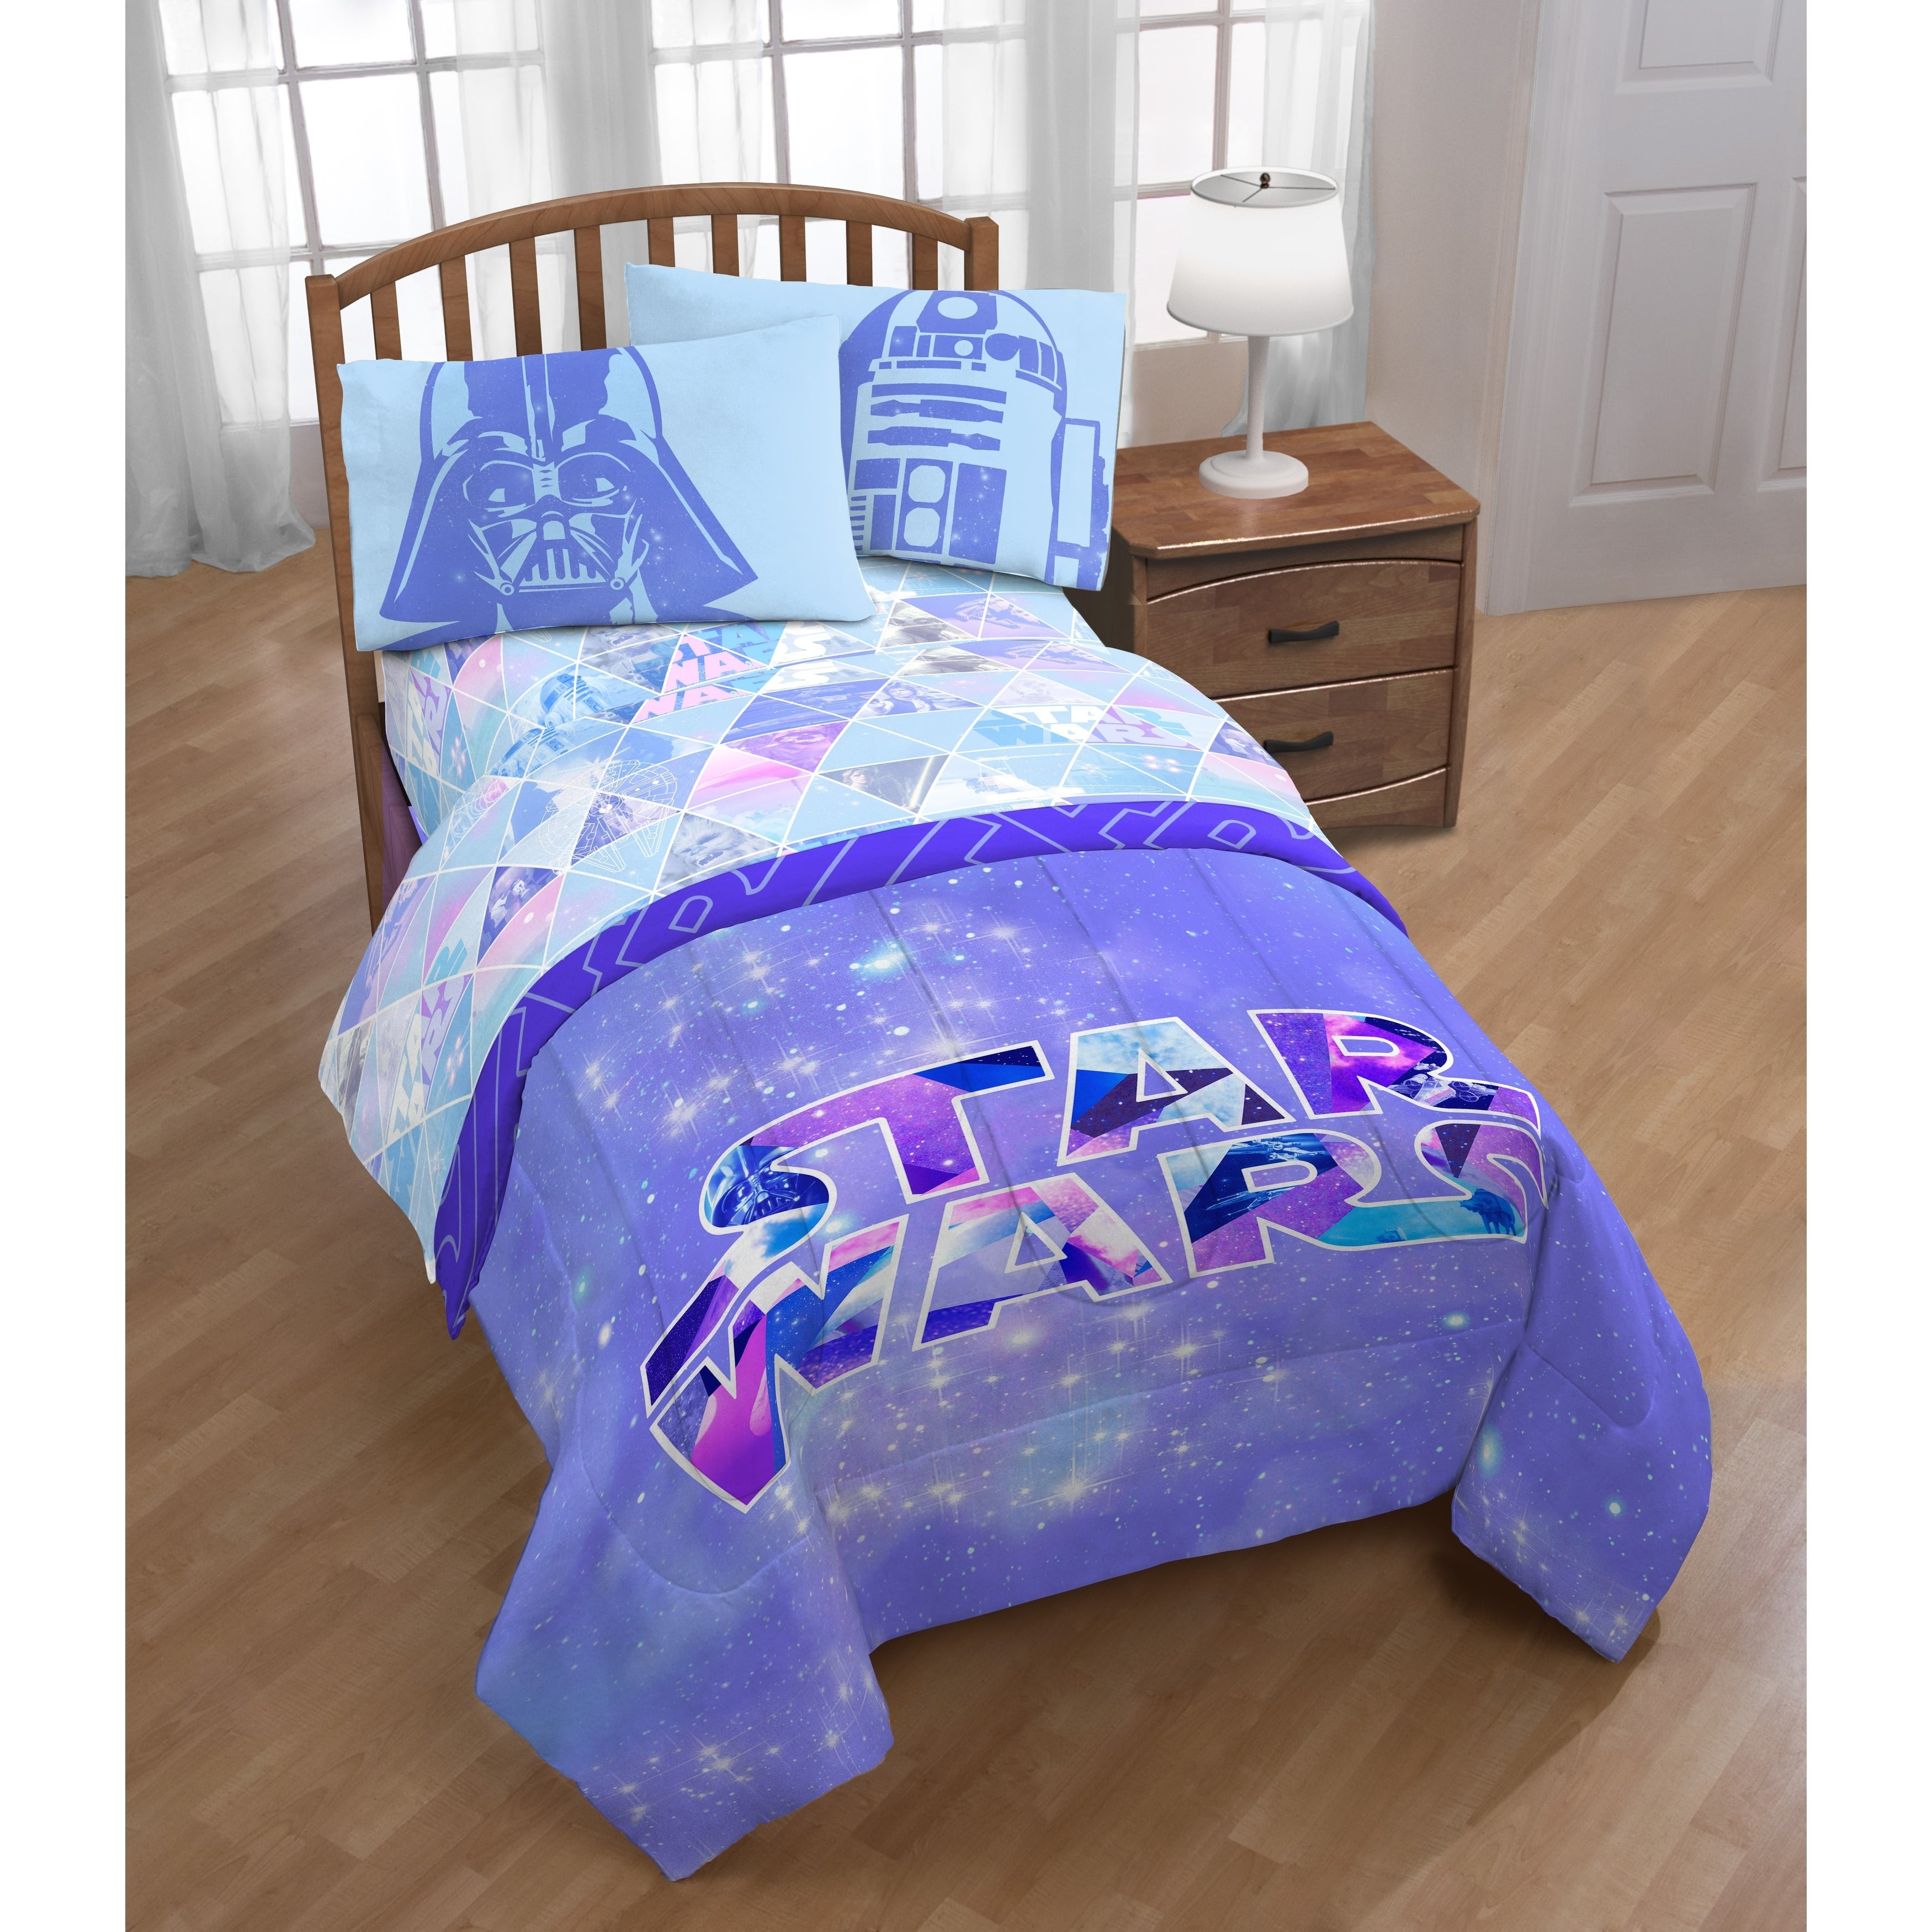 hippie hanging pin burning celestial tapestry mandala rainbowhandicraft bedspread comforter sleep sun wall psychedelic art